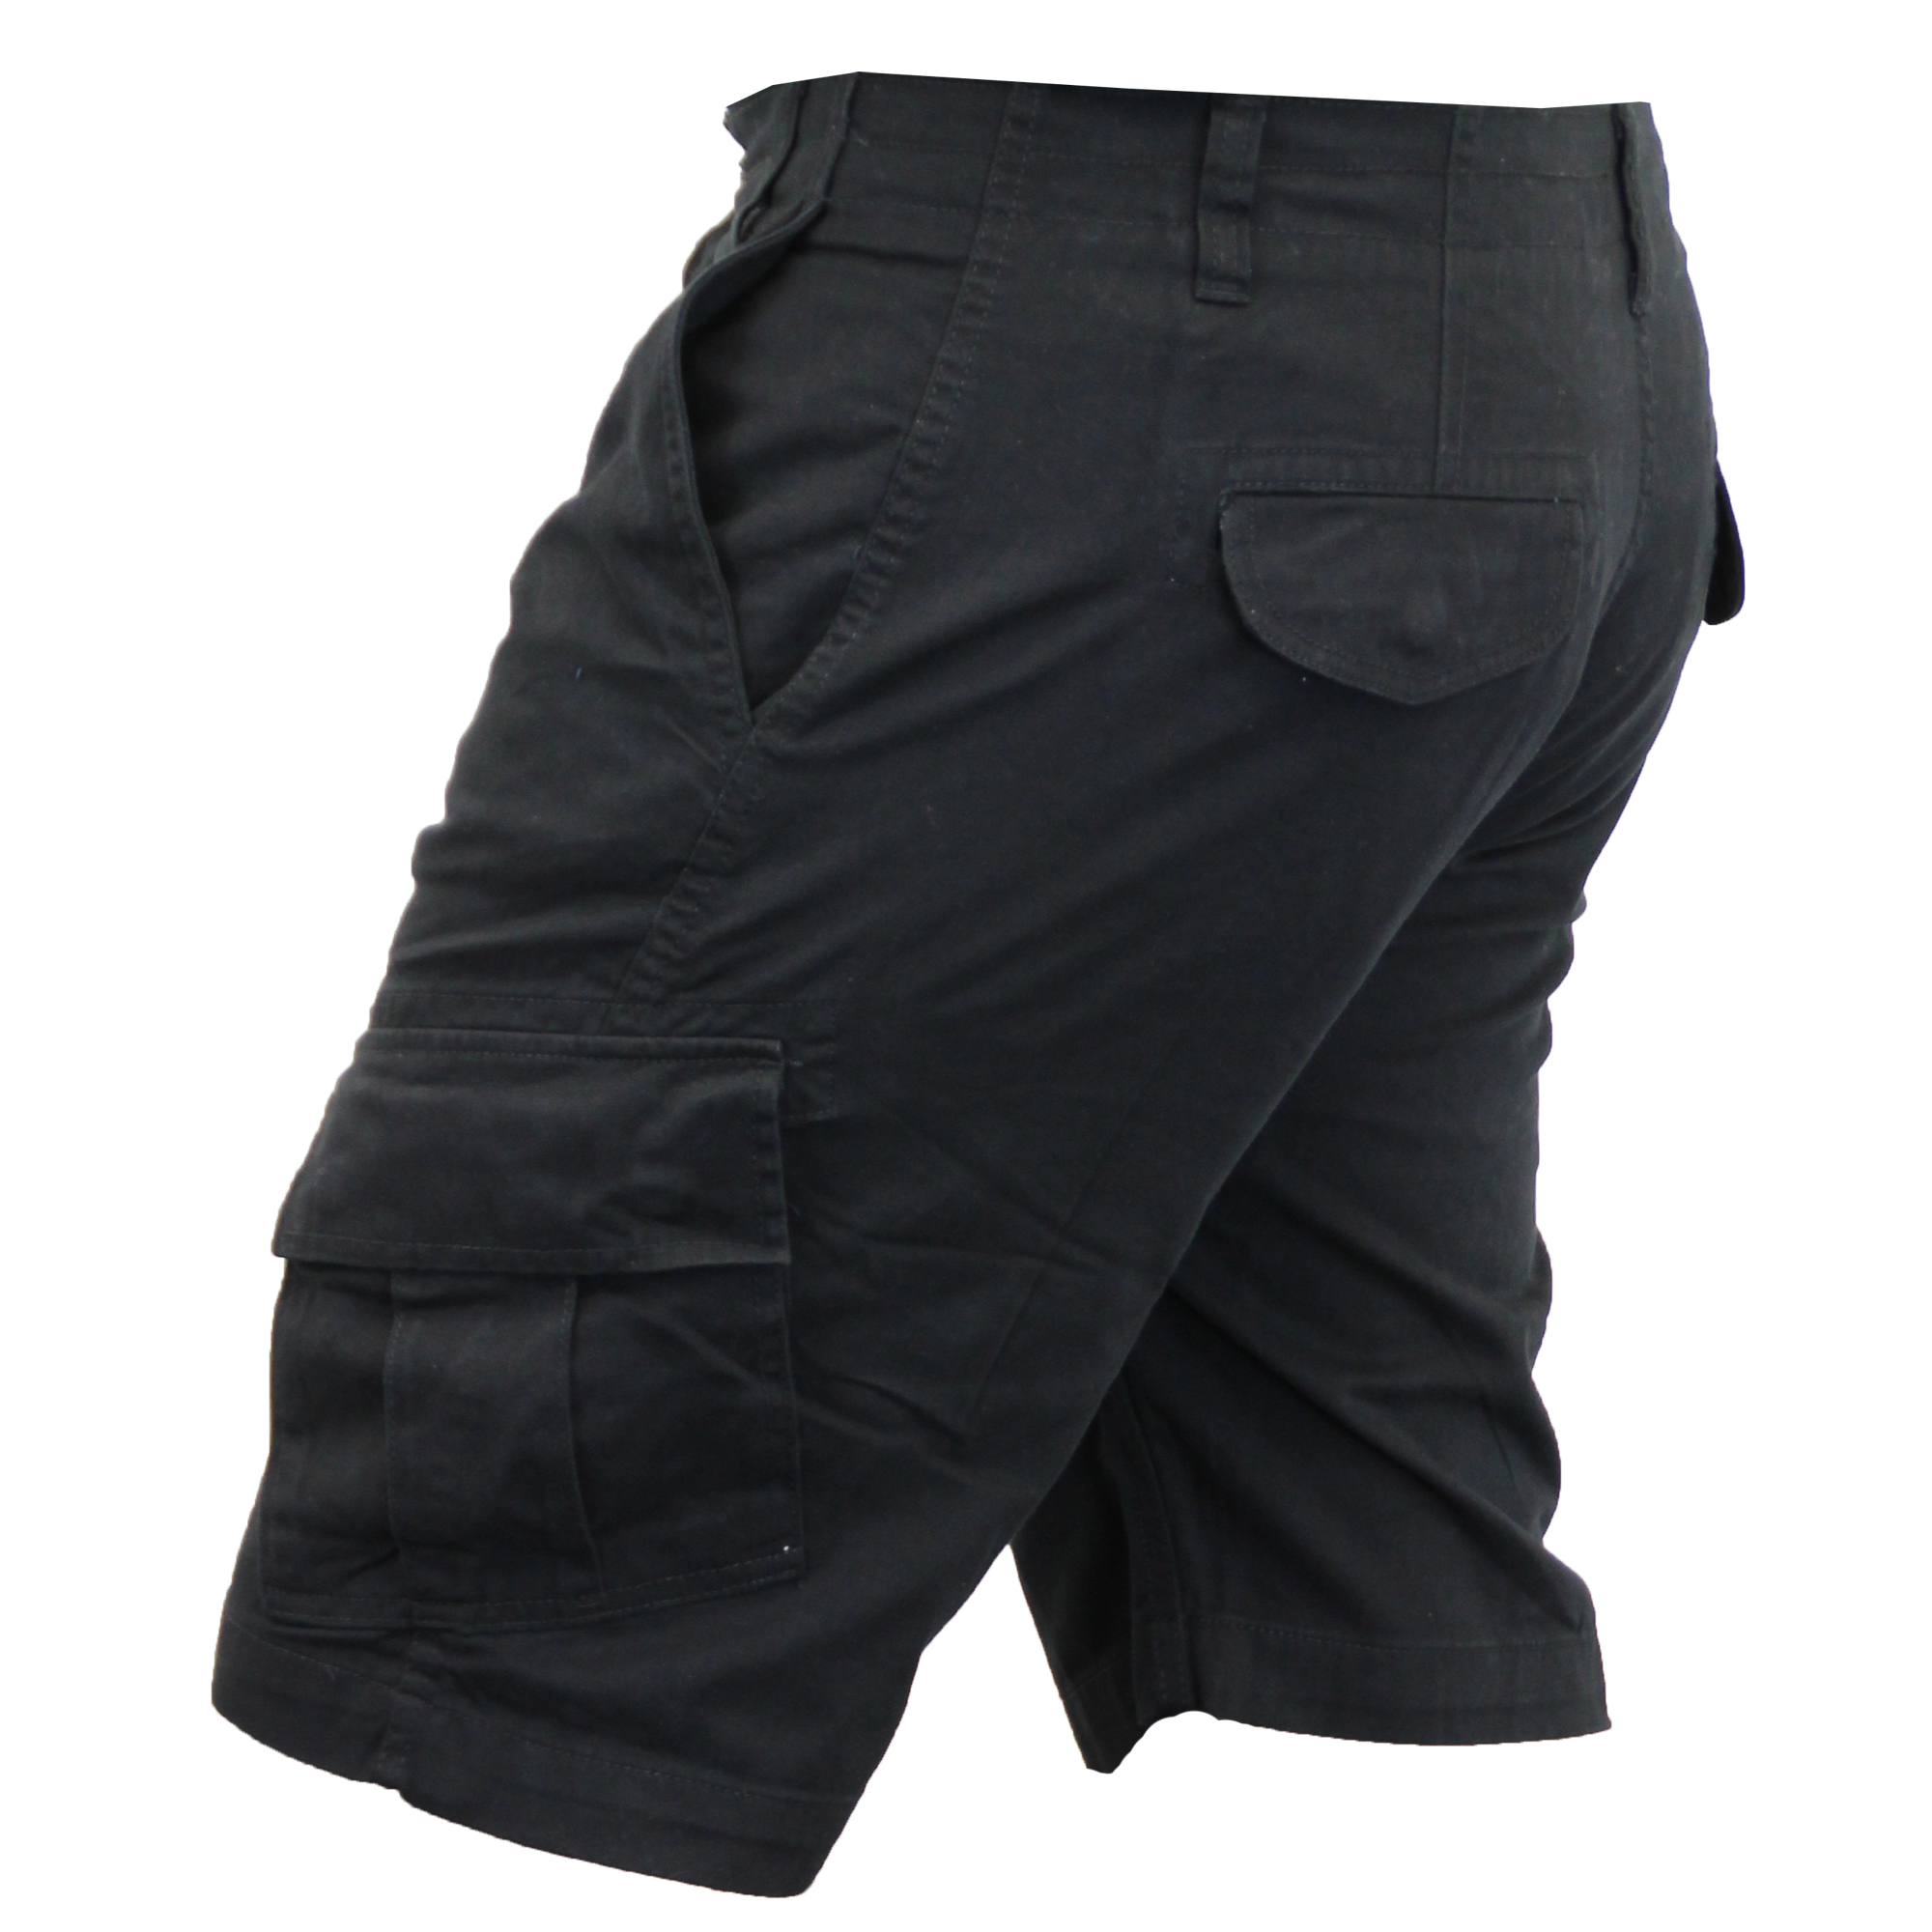 Mens-Cargo-Chino-Shorts-Threadbare-Combat-Knee-Length-Westace-Military-Summer thumbnail 4